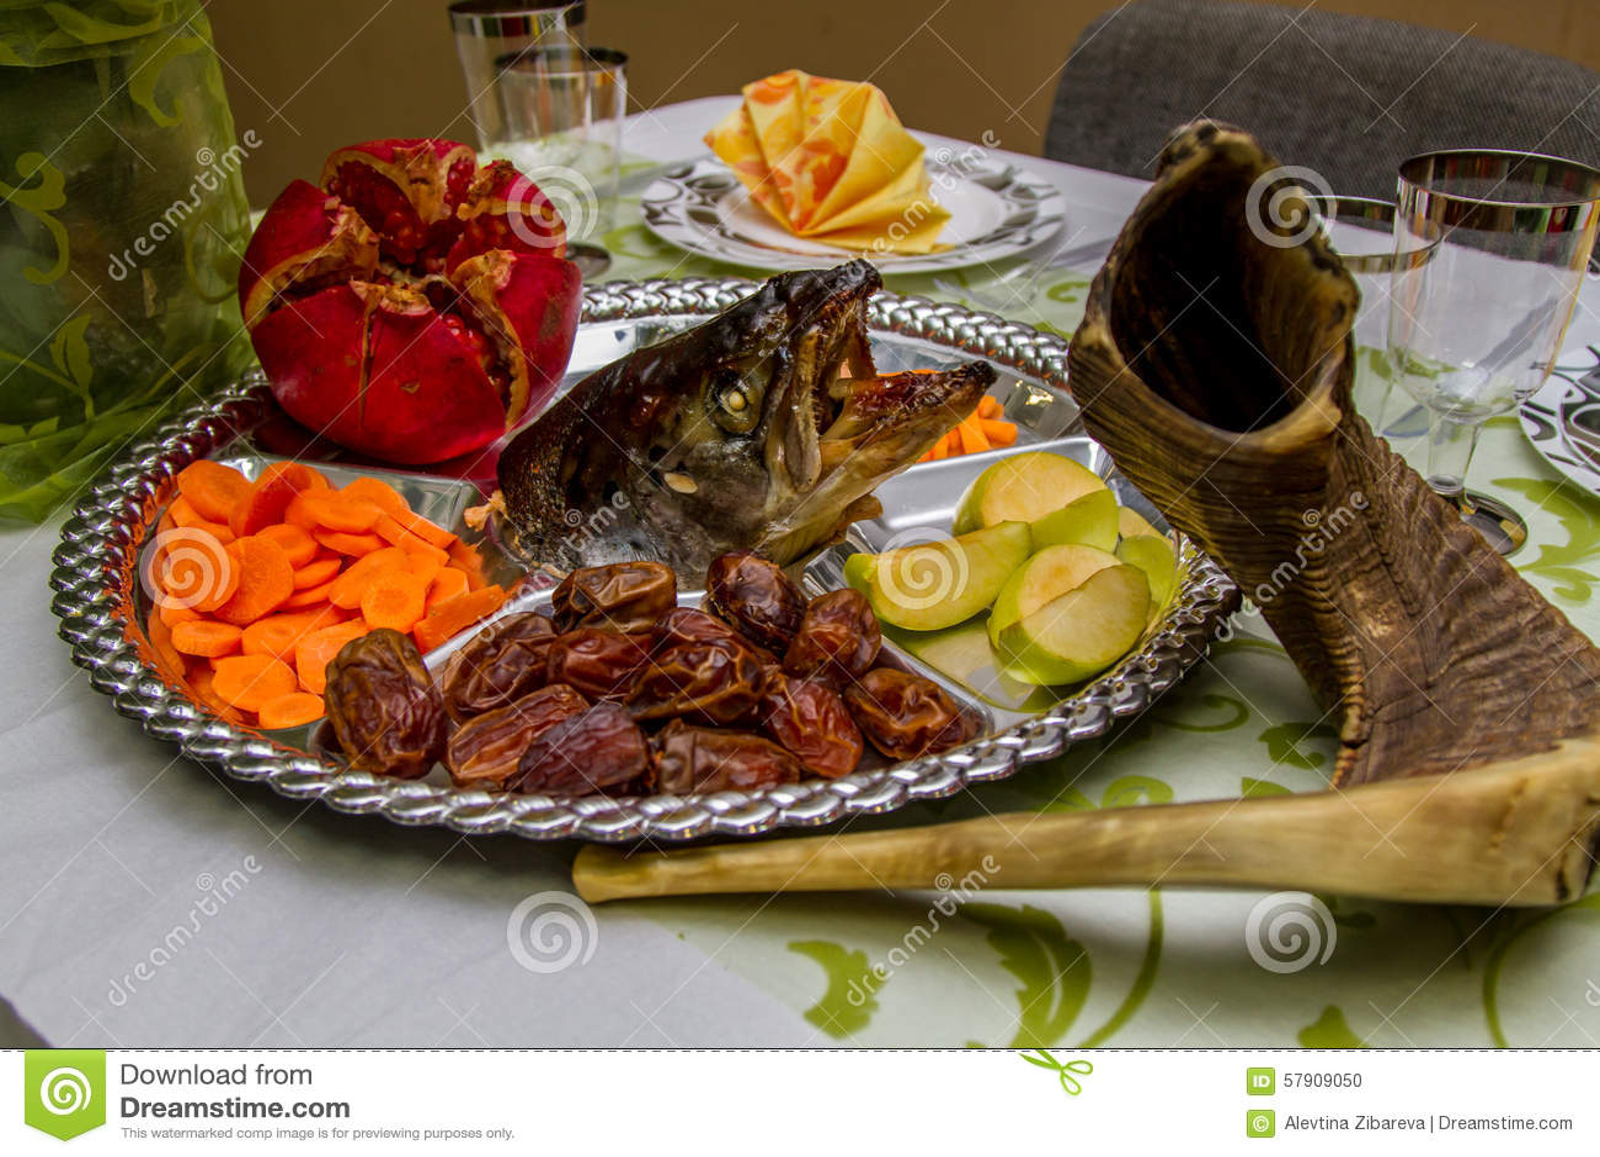 Jewish holidays rosh ha shana stock photo image 57909050 for Jewish fish dish